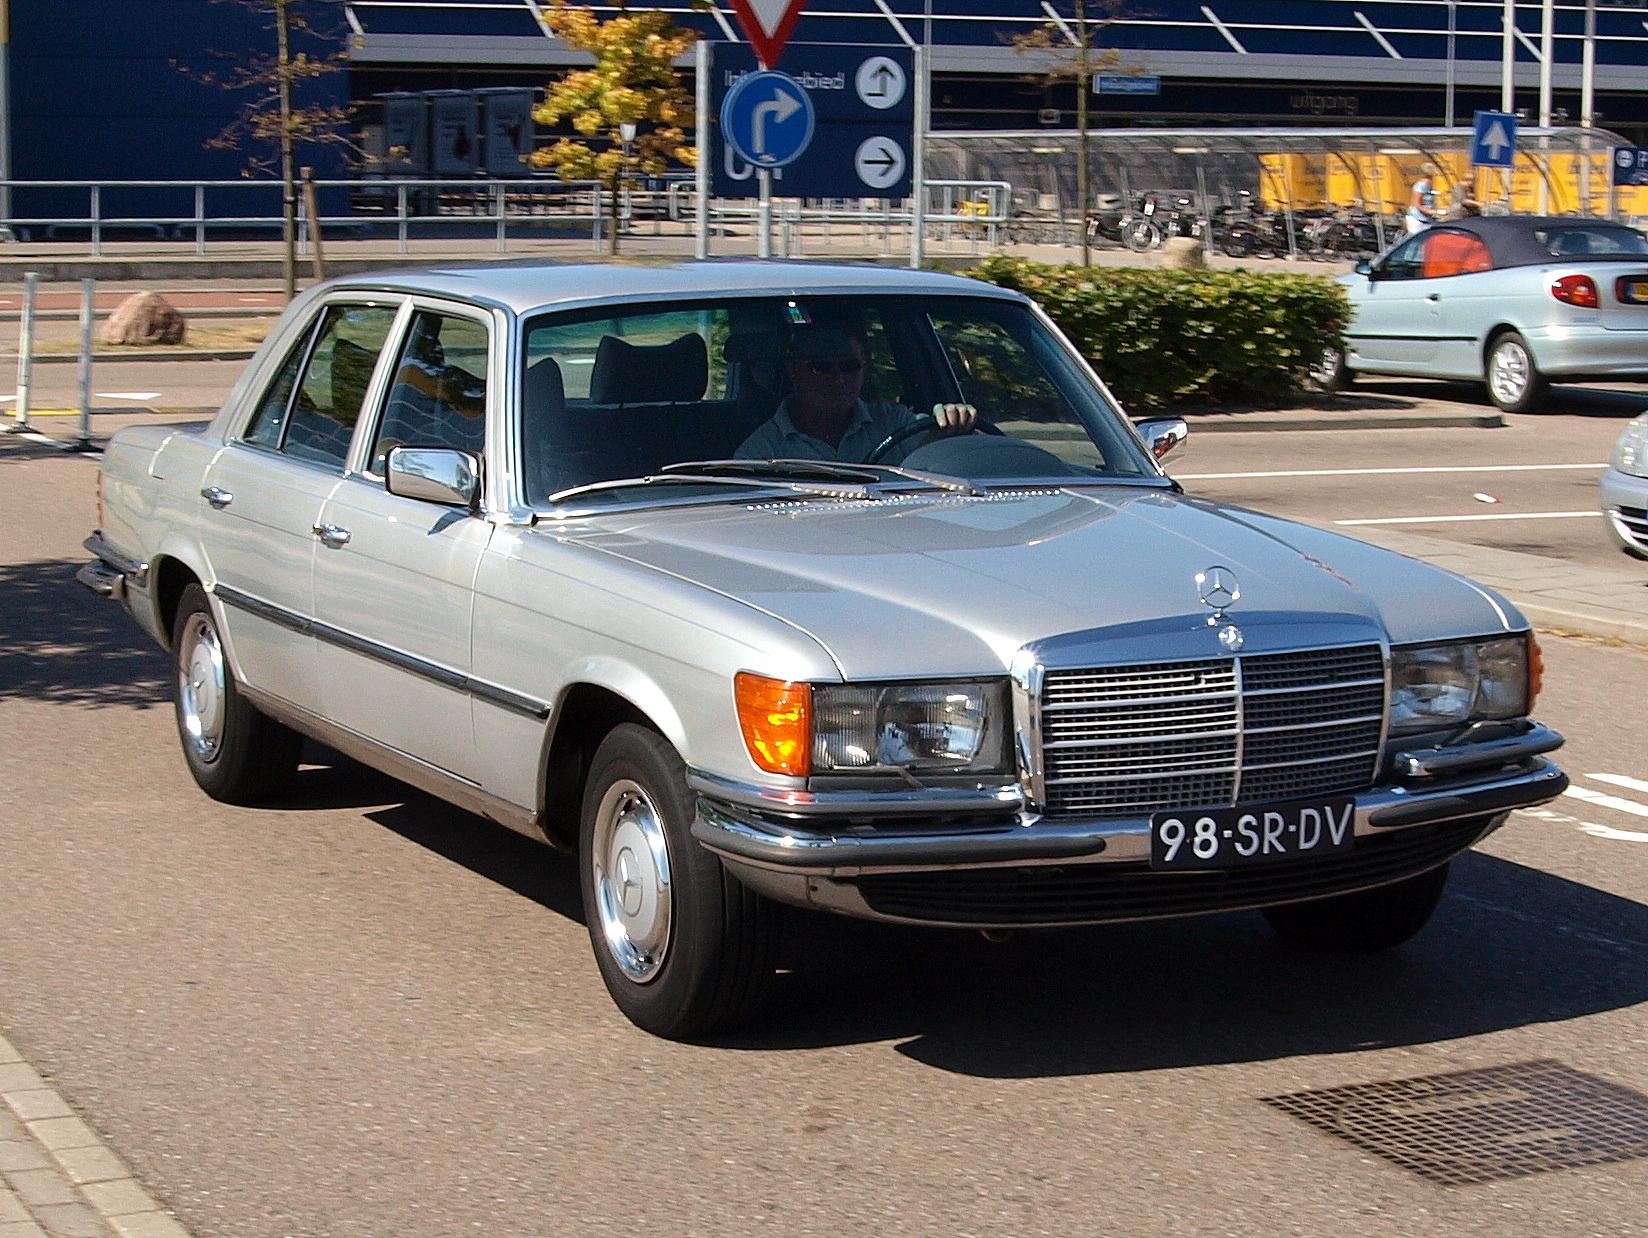 File Mercedes Benz 280se 98 Sr Dv Jpg Wikimedia Commons